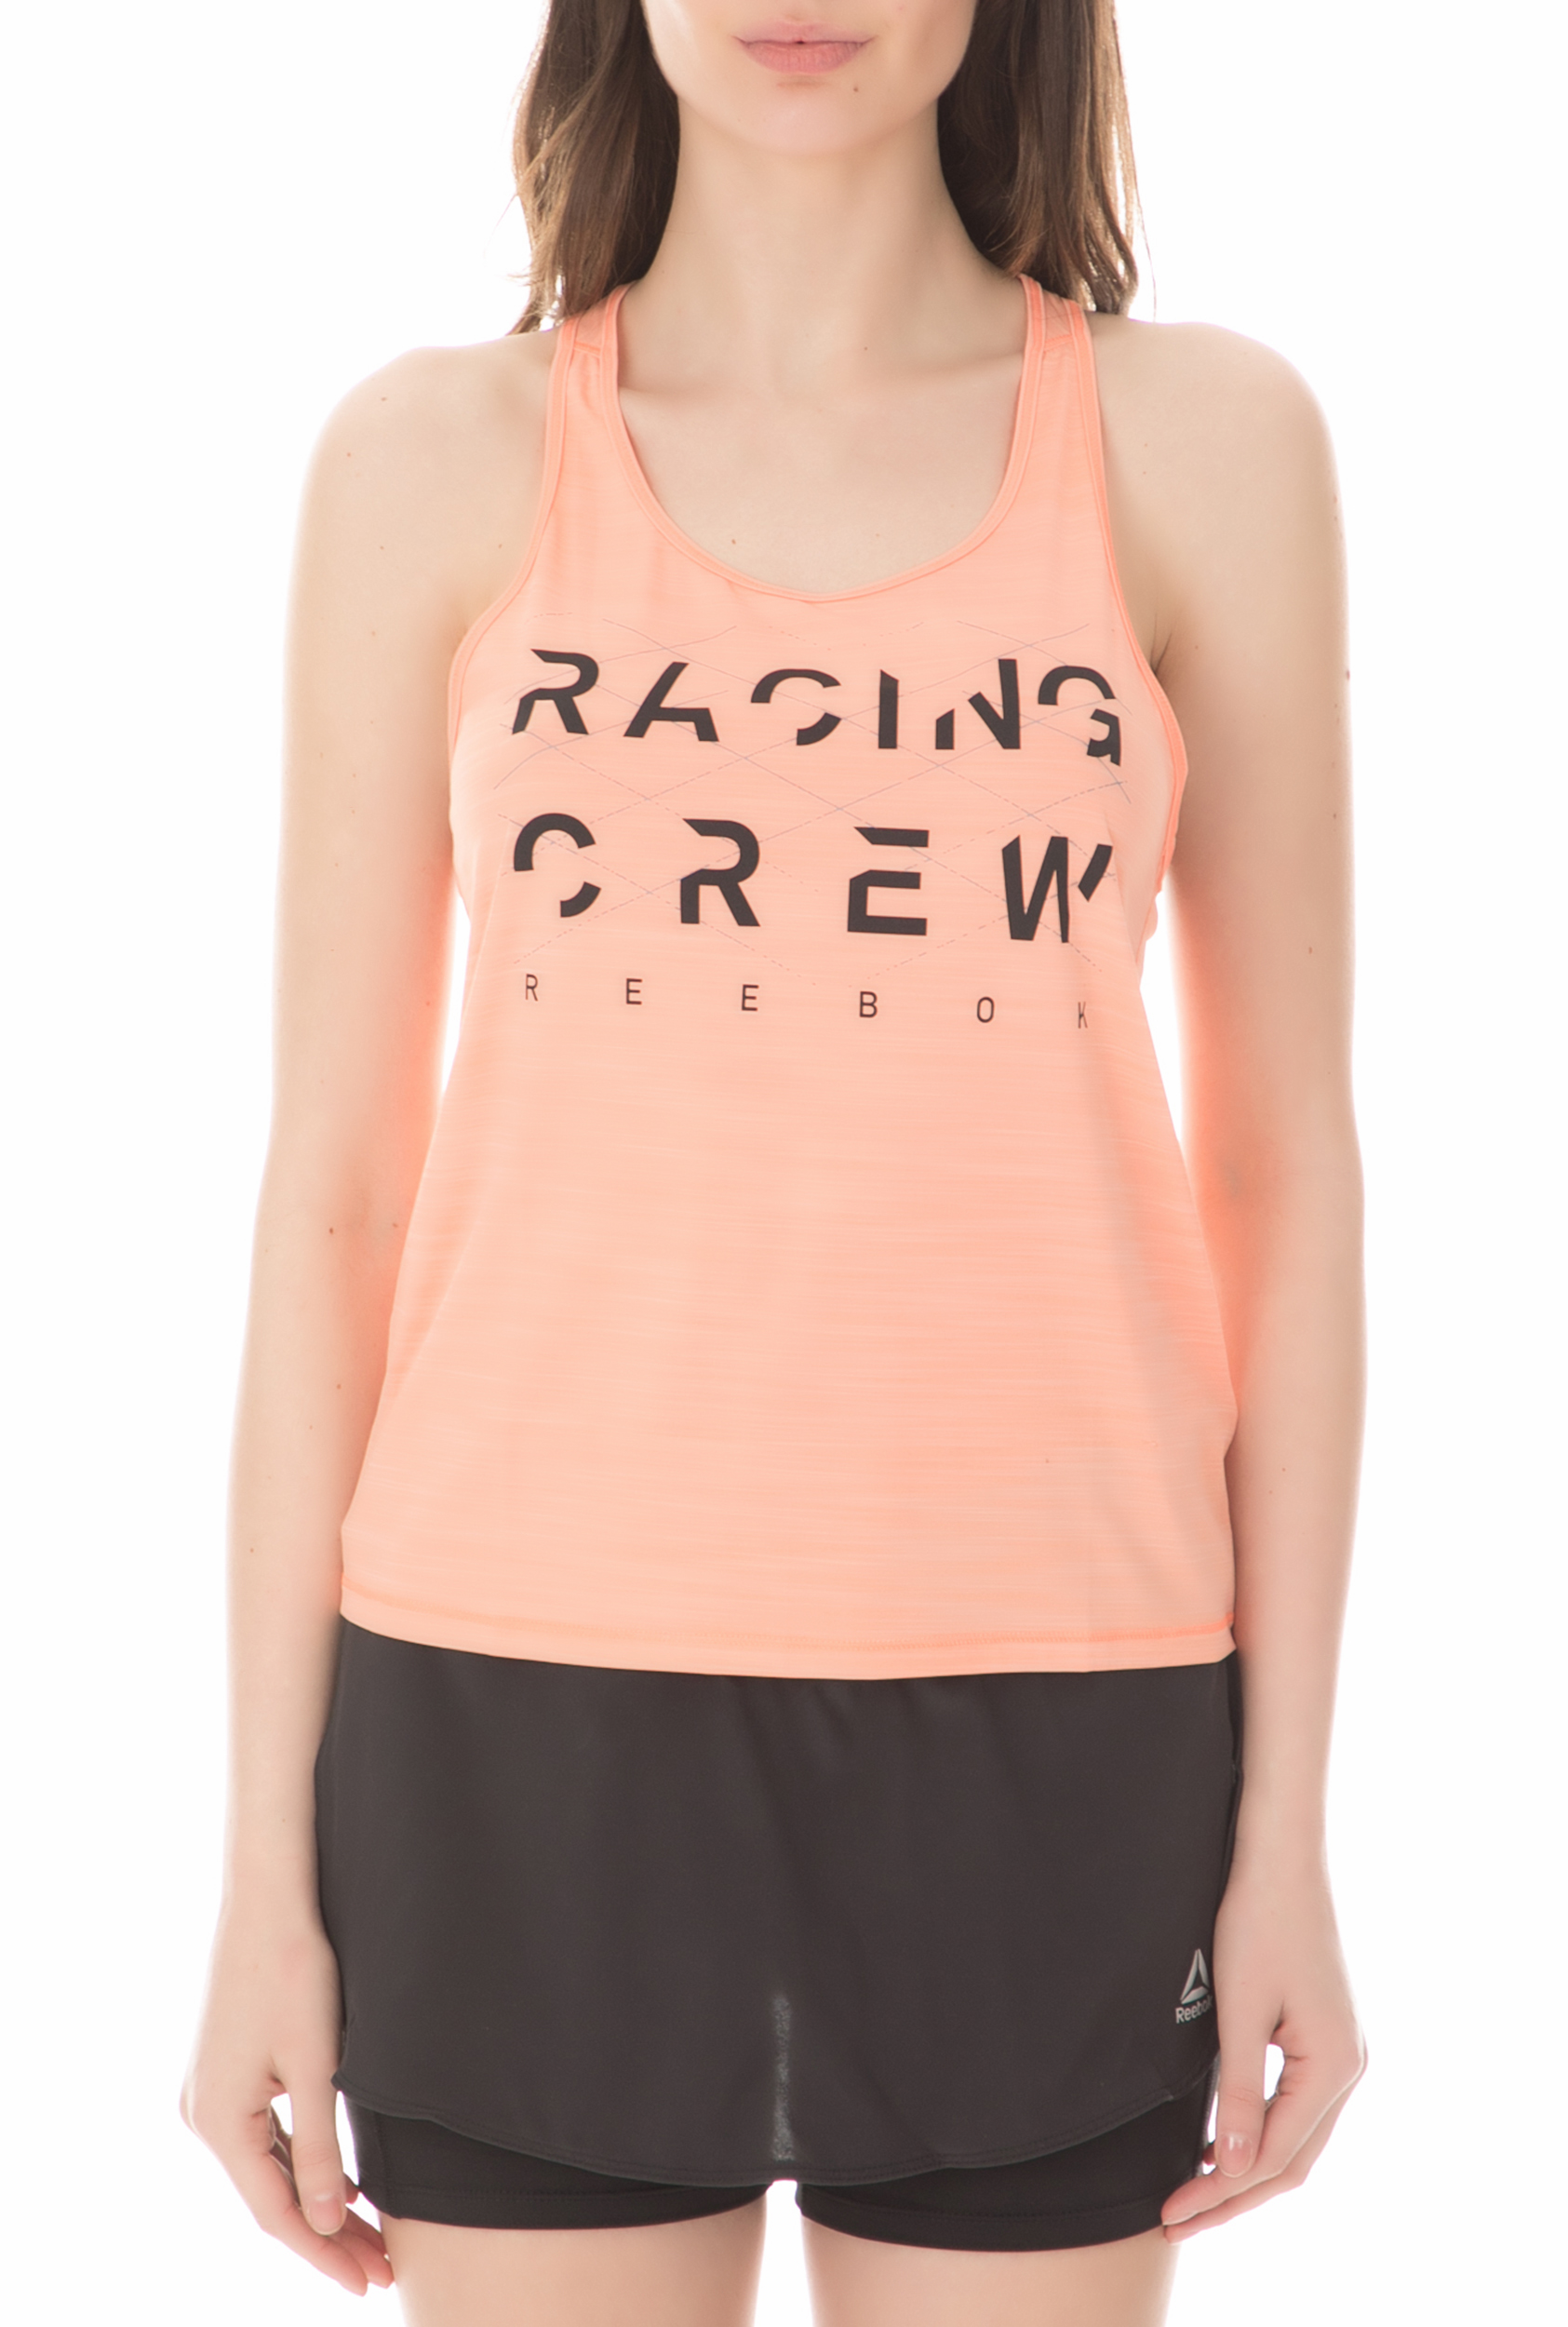 Reebok Fitness - Γυναικεία αμάνικη μπλούζα Reebok OSR AC πορτοκαλί